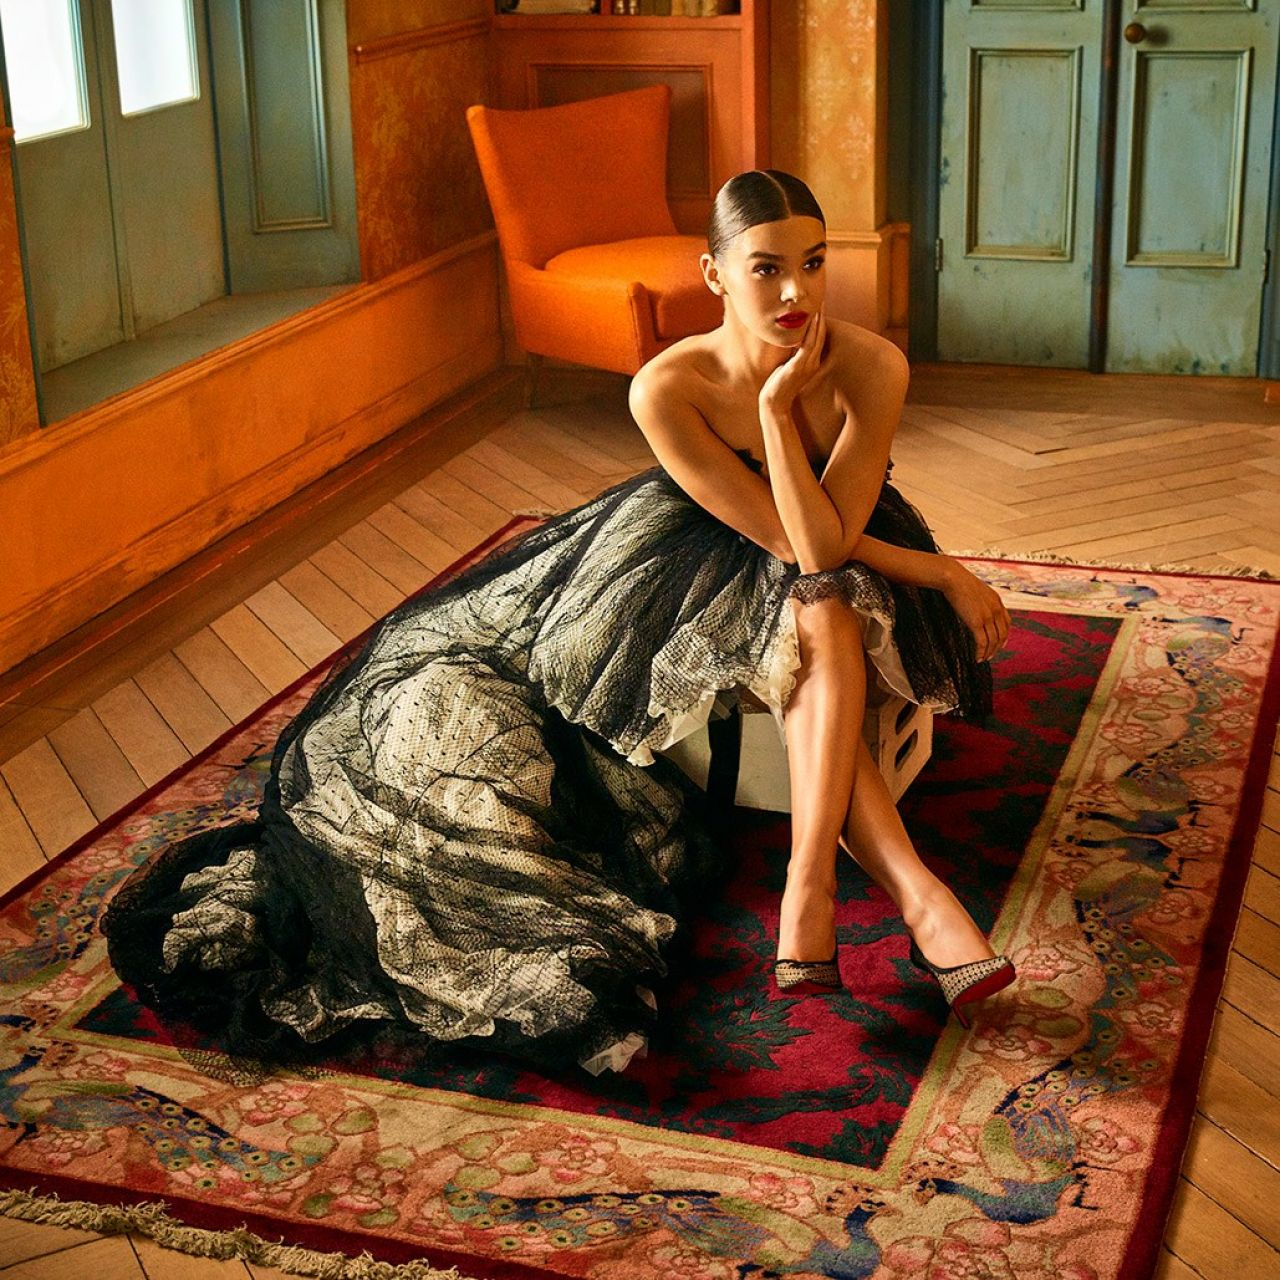 http://celebmafia.com/wp-content/uploads/2018/03/hailee-steinfeld-photoshoot-90th-academy-awards-hollywood-march-2018-0.jpg